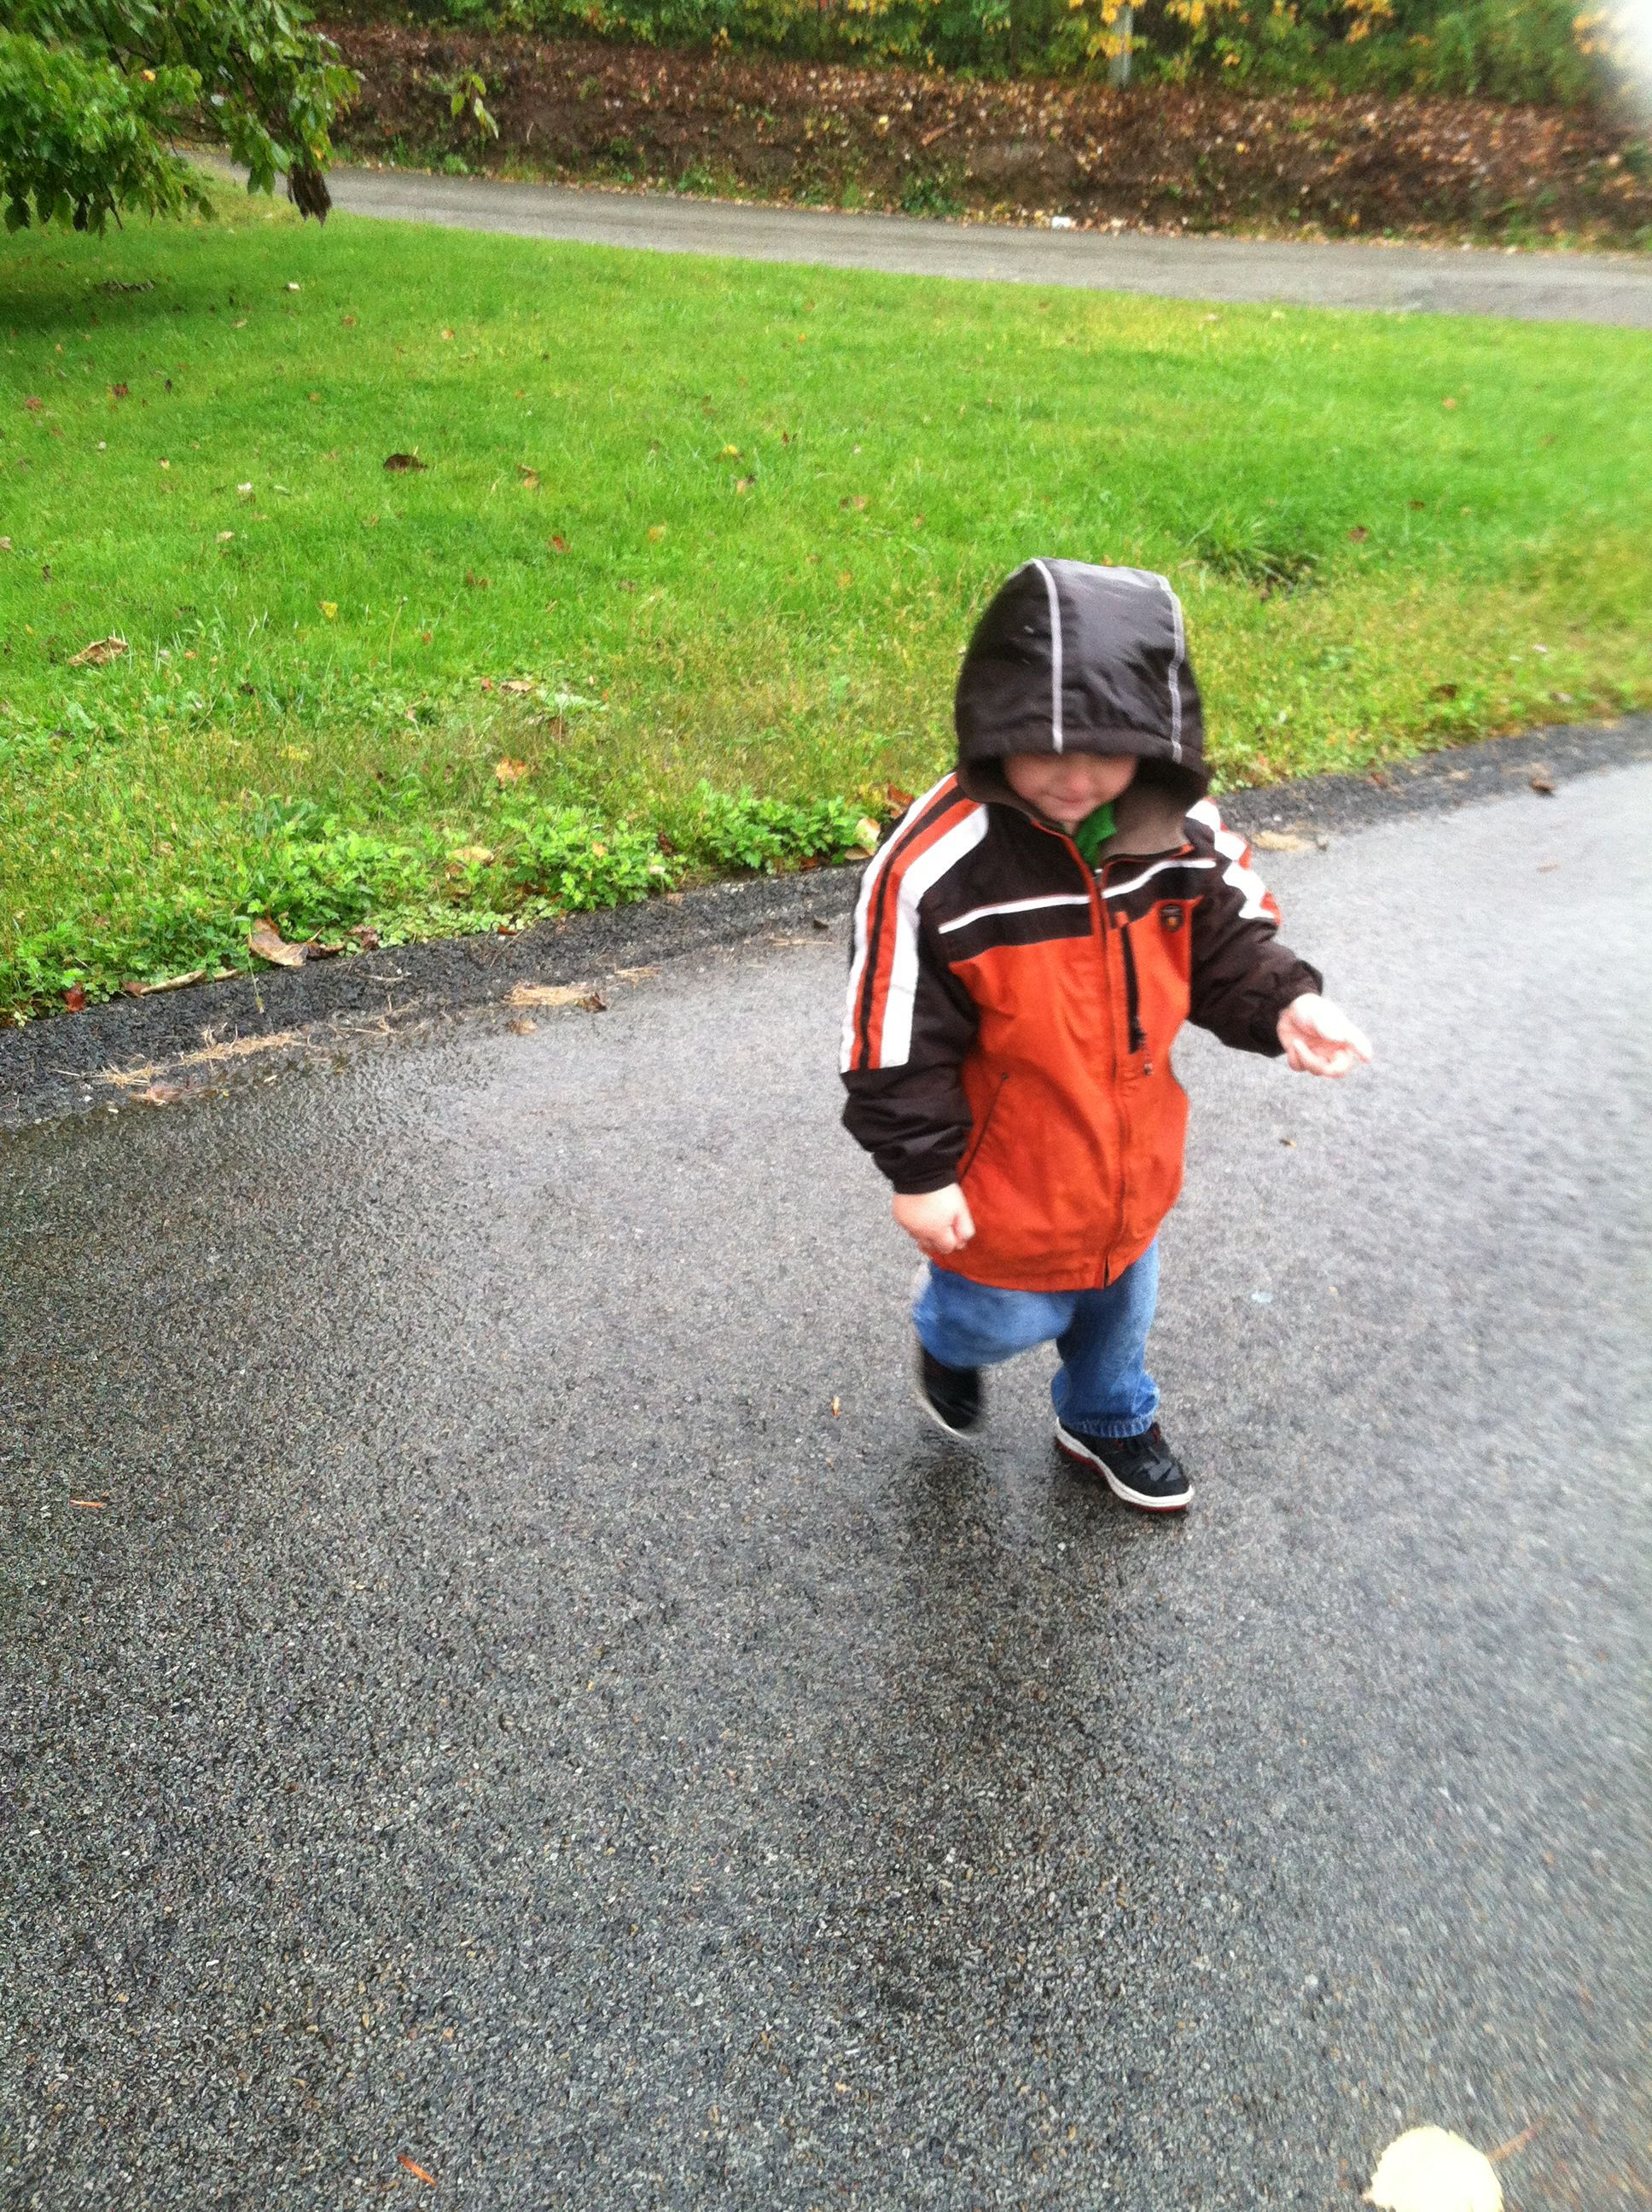 Zachary playing in the rain